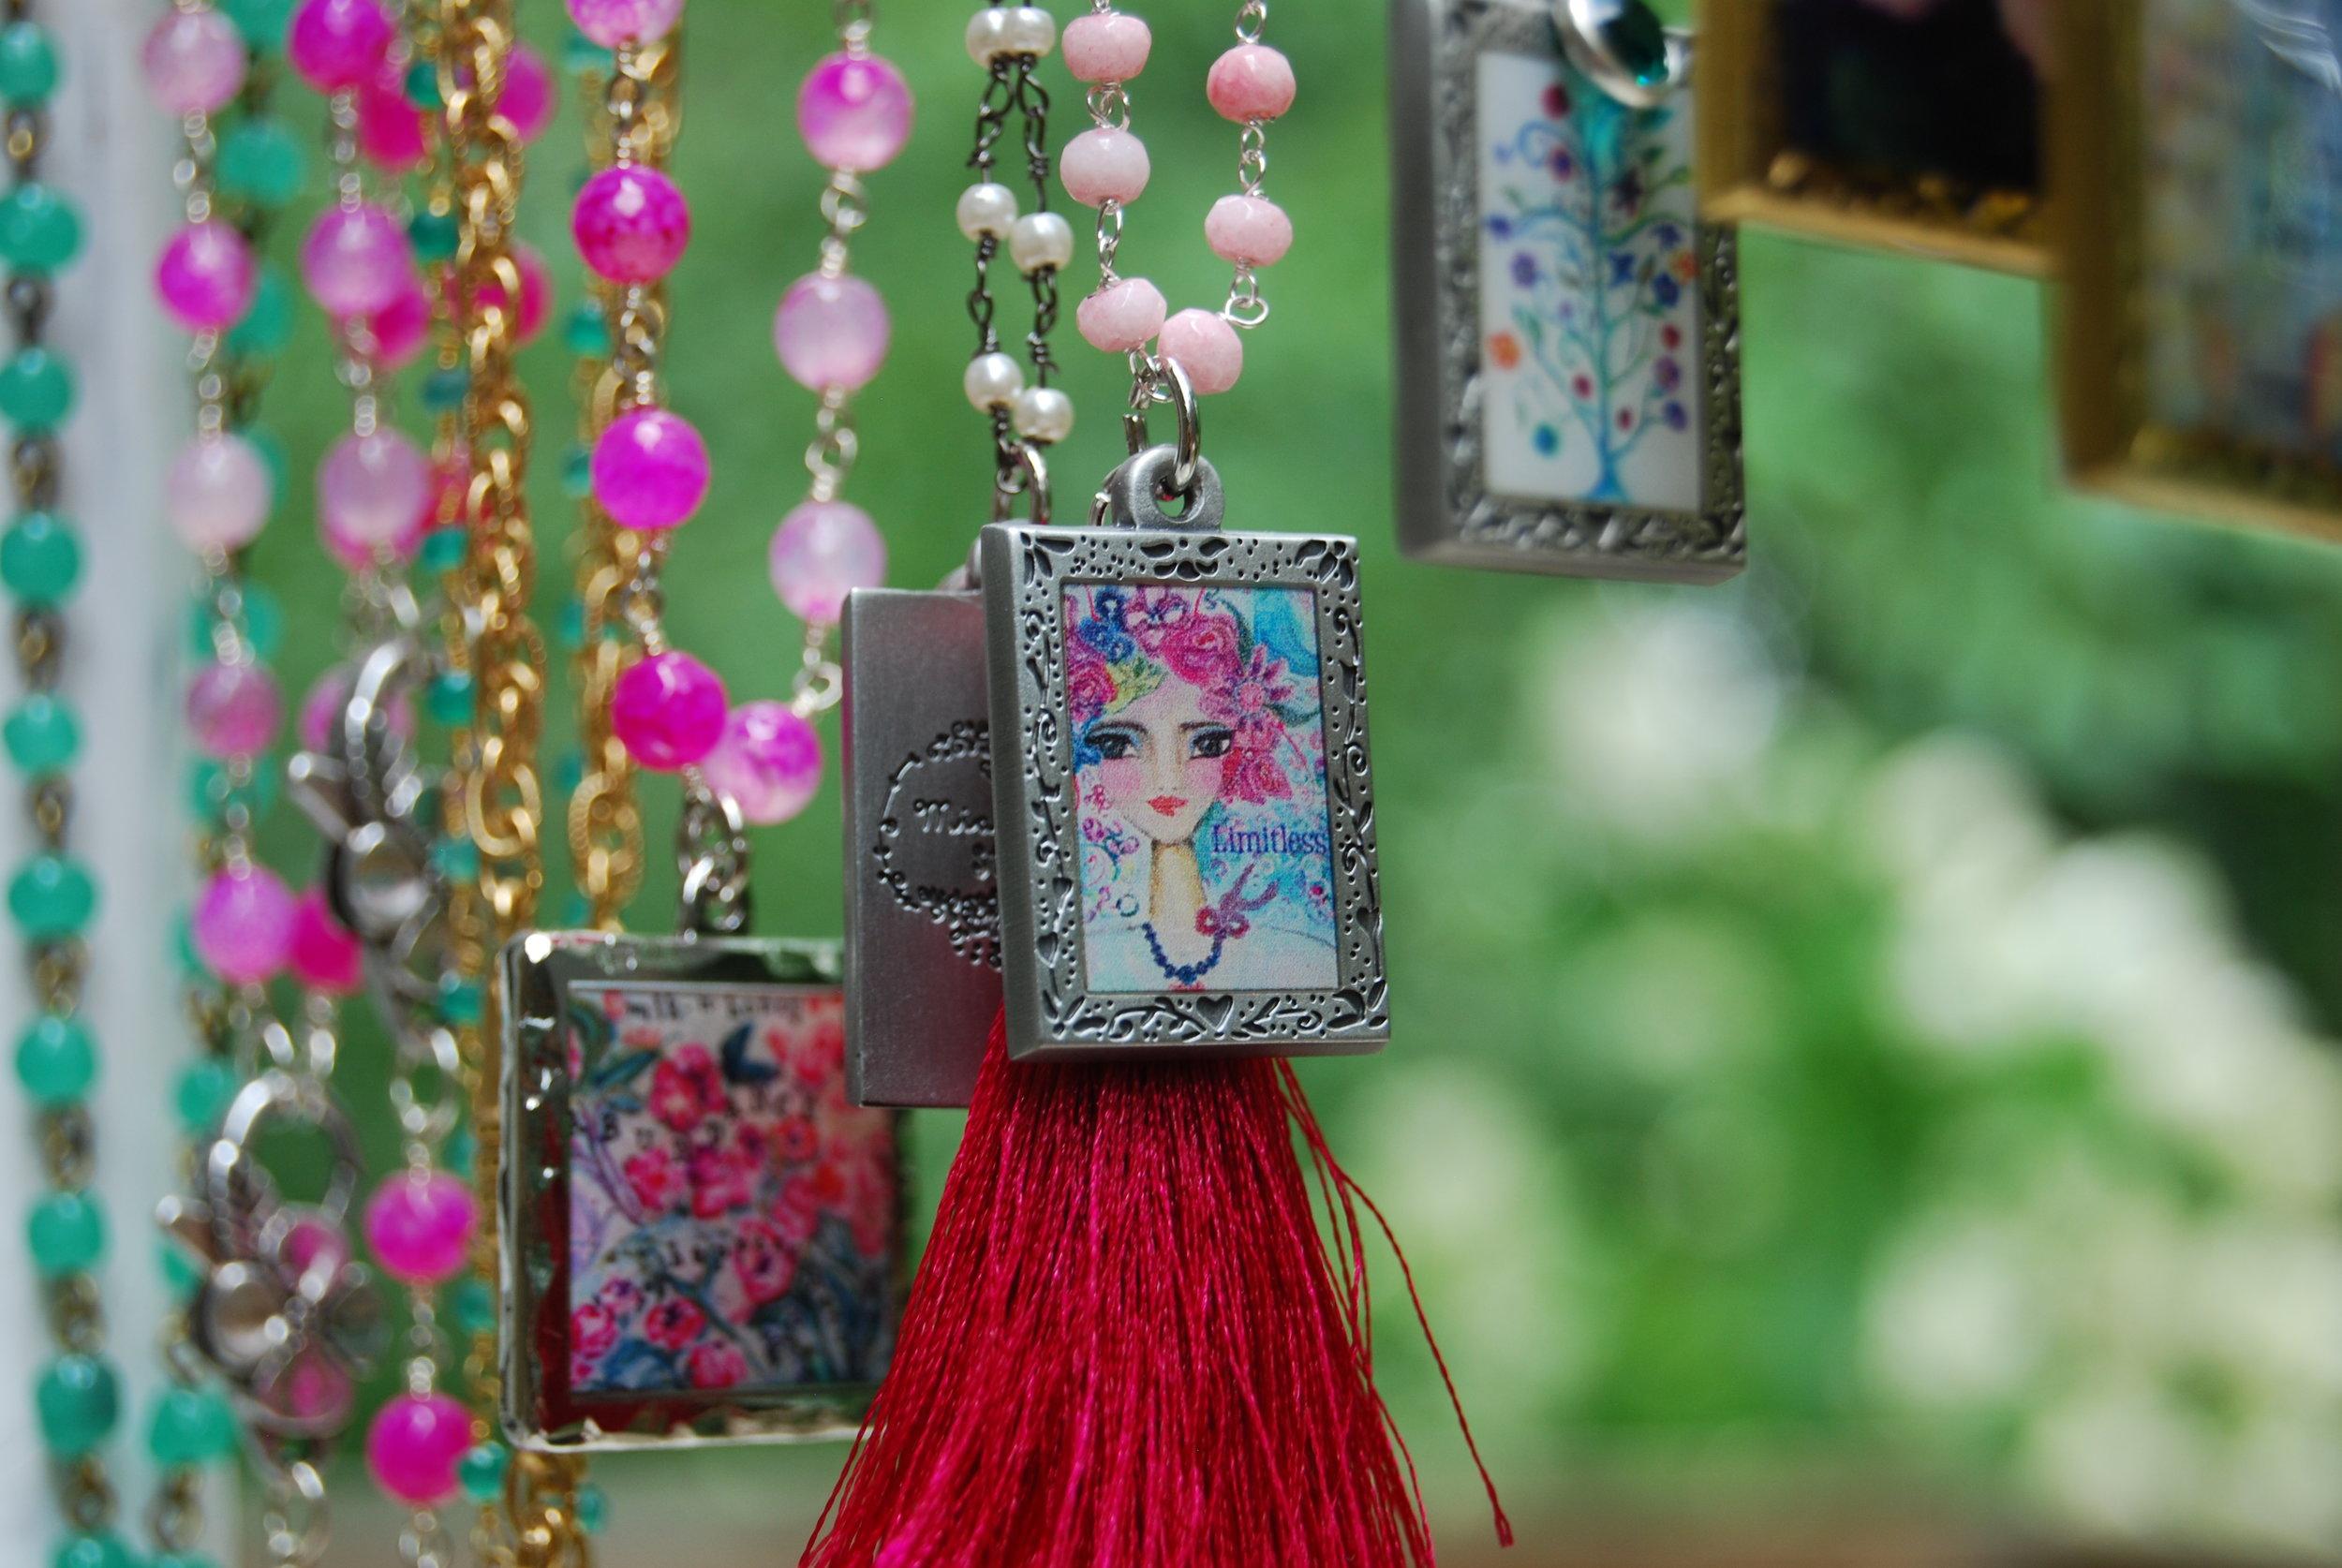 jewelry - Miniature prints on custom pendants - so fun